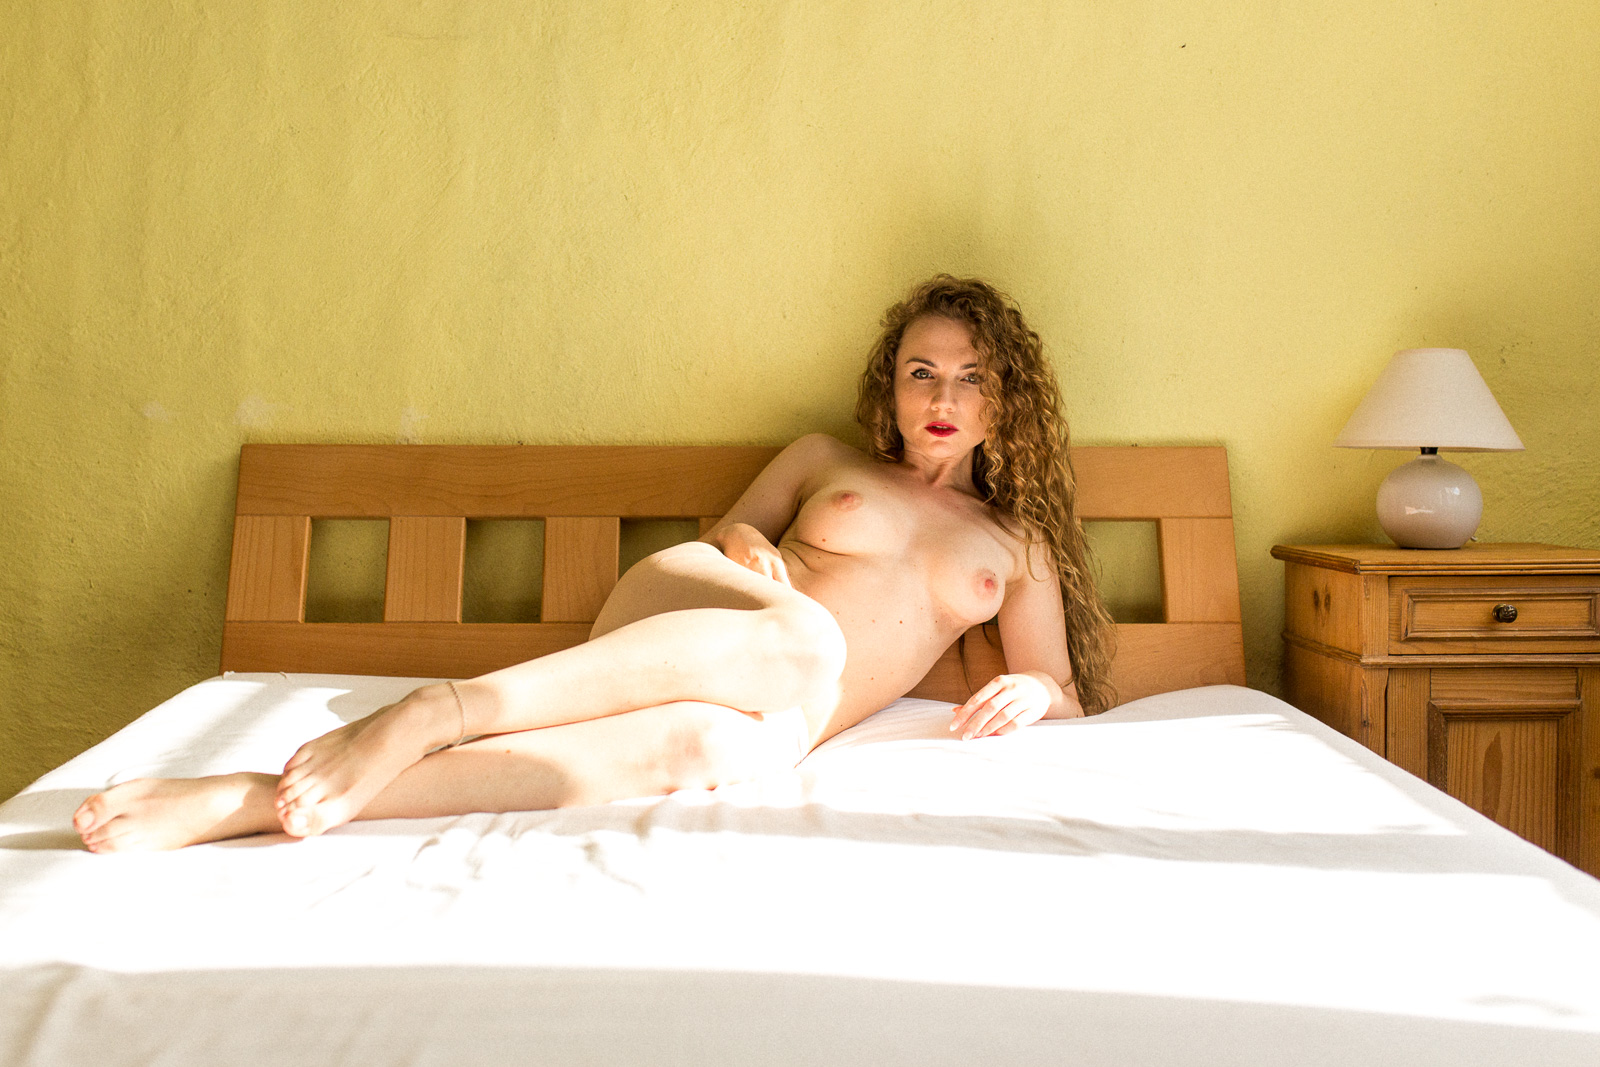 Christin auf dem Bett - Boudoir Christin im Sessel - Akt Erotik Boudoir Fotograf sexy Homeshooting nackt